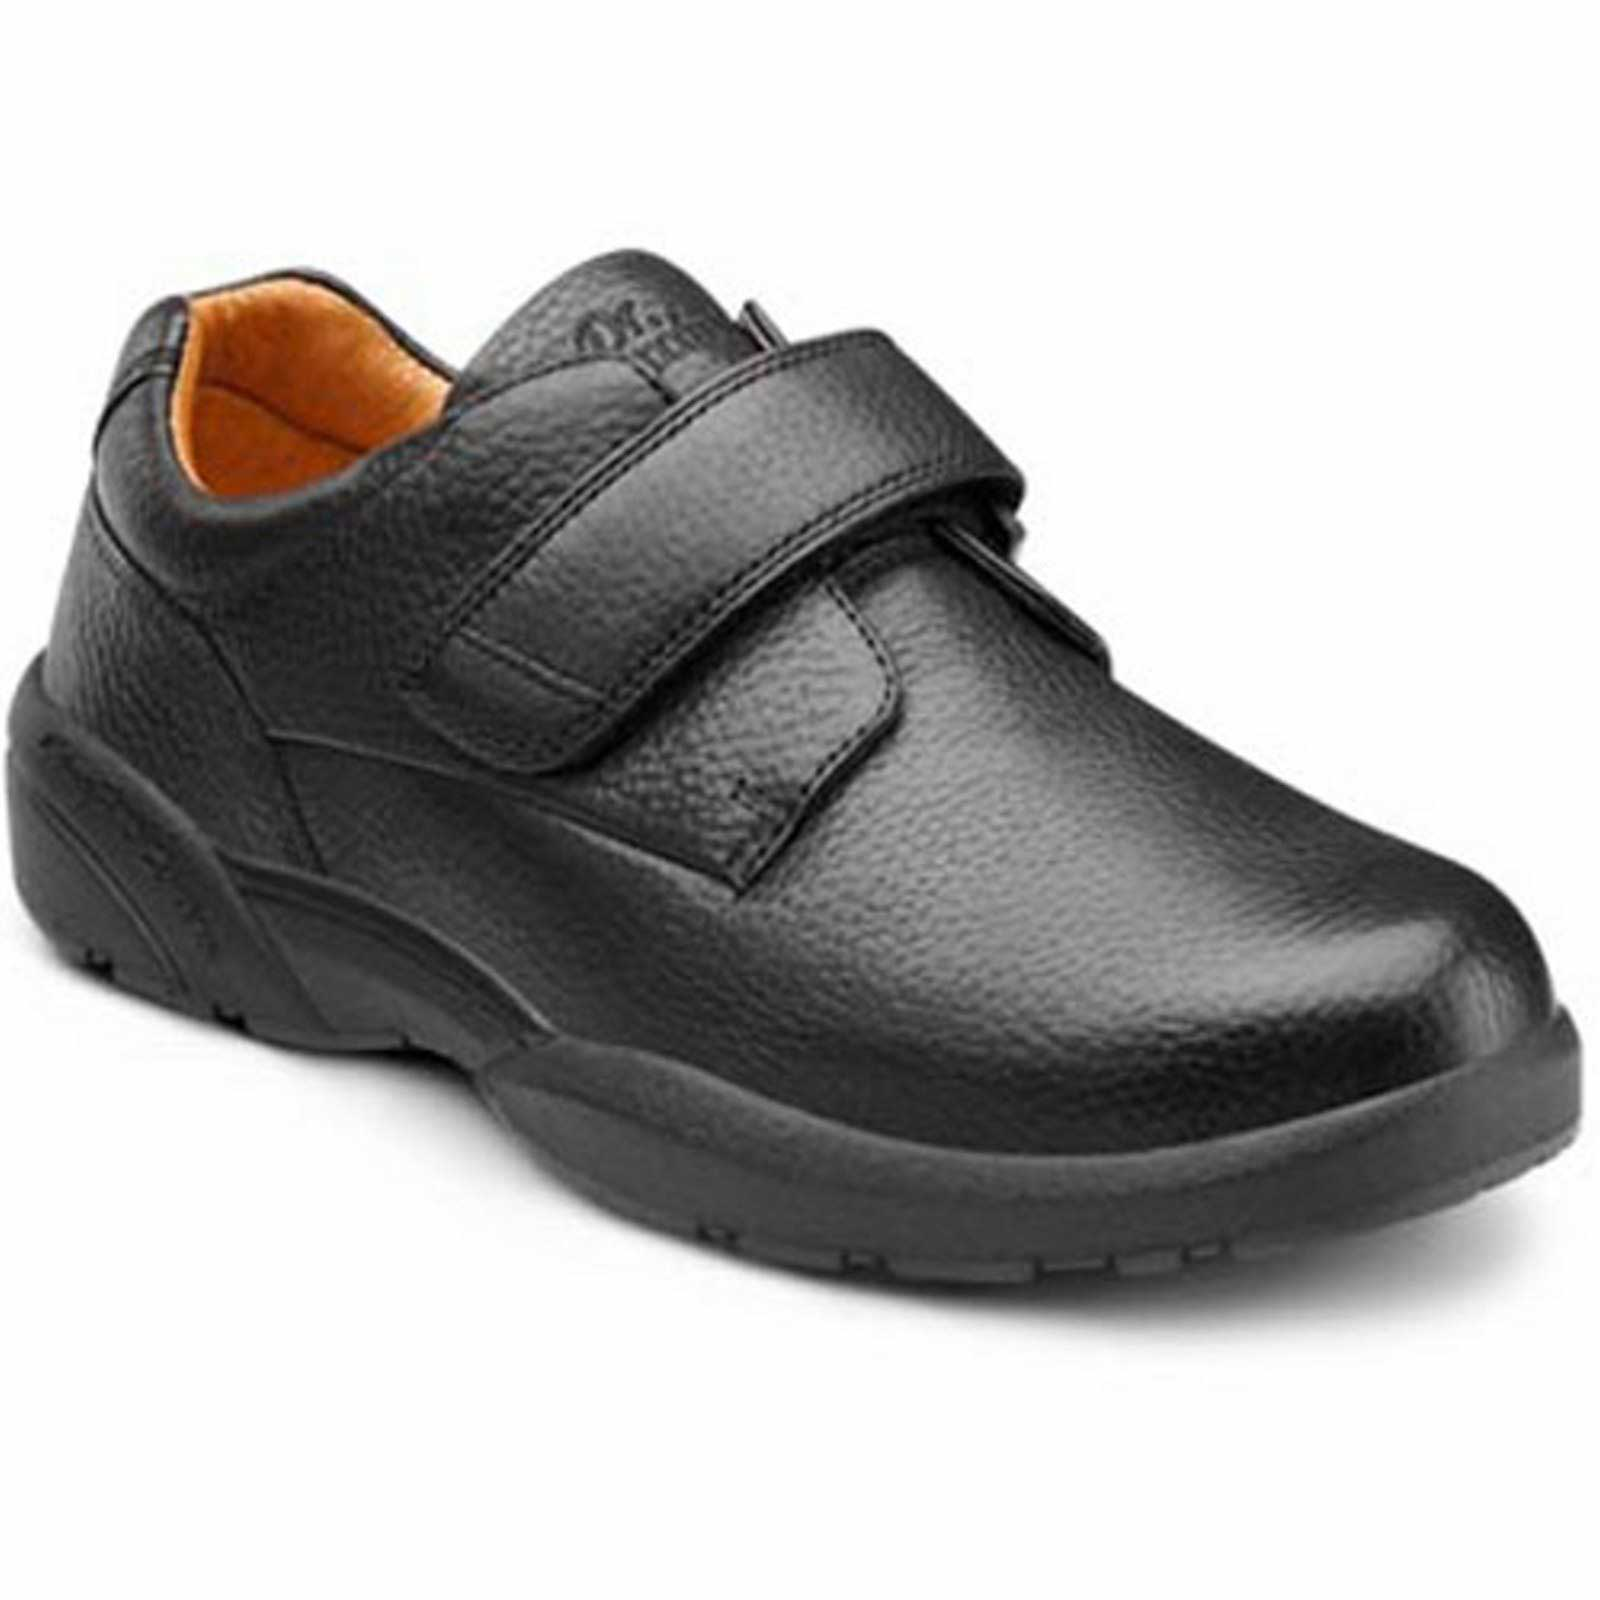 Dr Comfort REFRESH Women's Therapeutic Diabetic Extra Depth Shoe